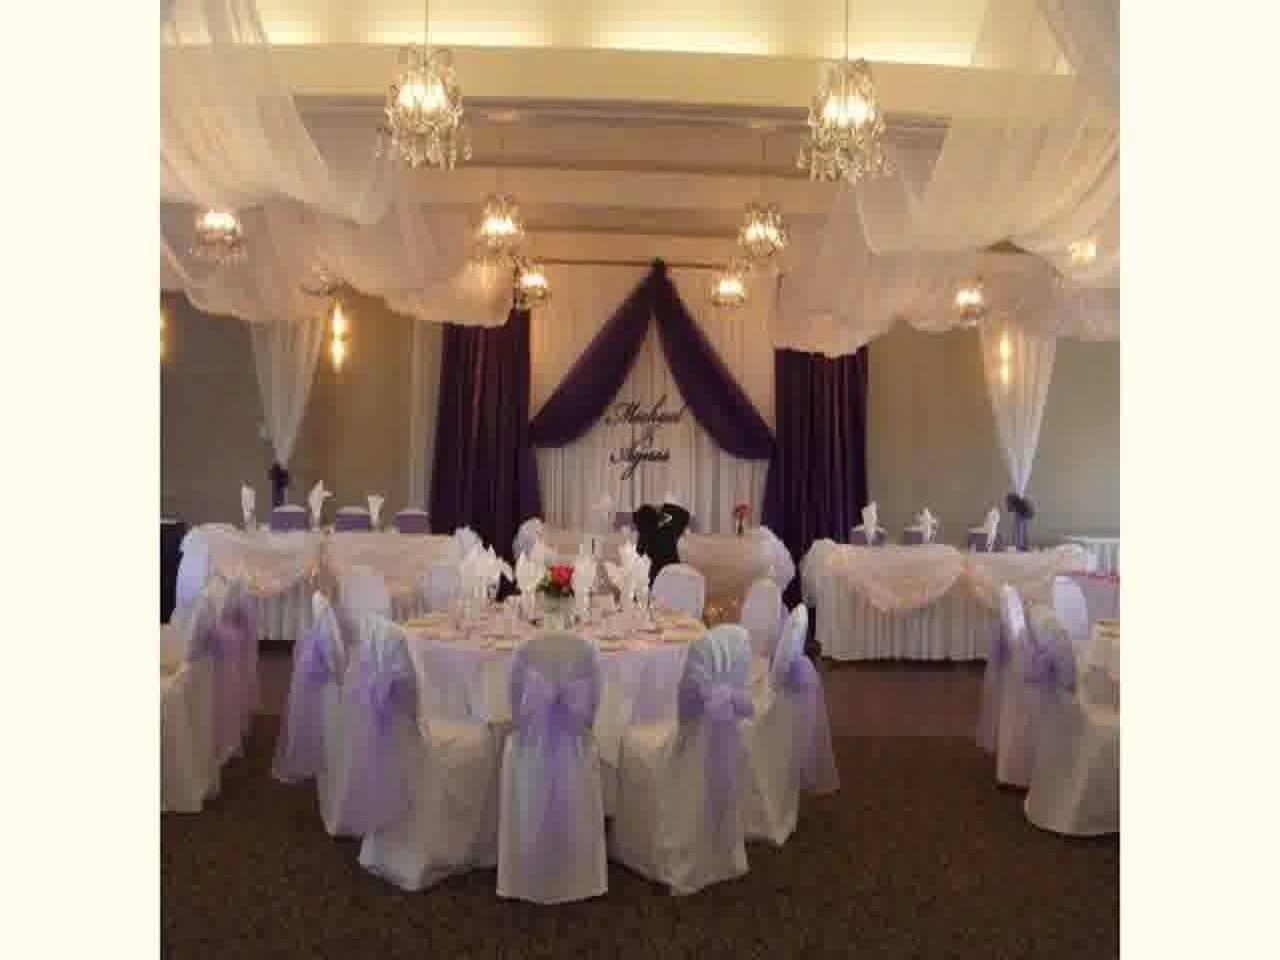 10 Stunning Decorating Ideas For Bridal Shower best wedding shower decoration ideas youtube 2020